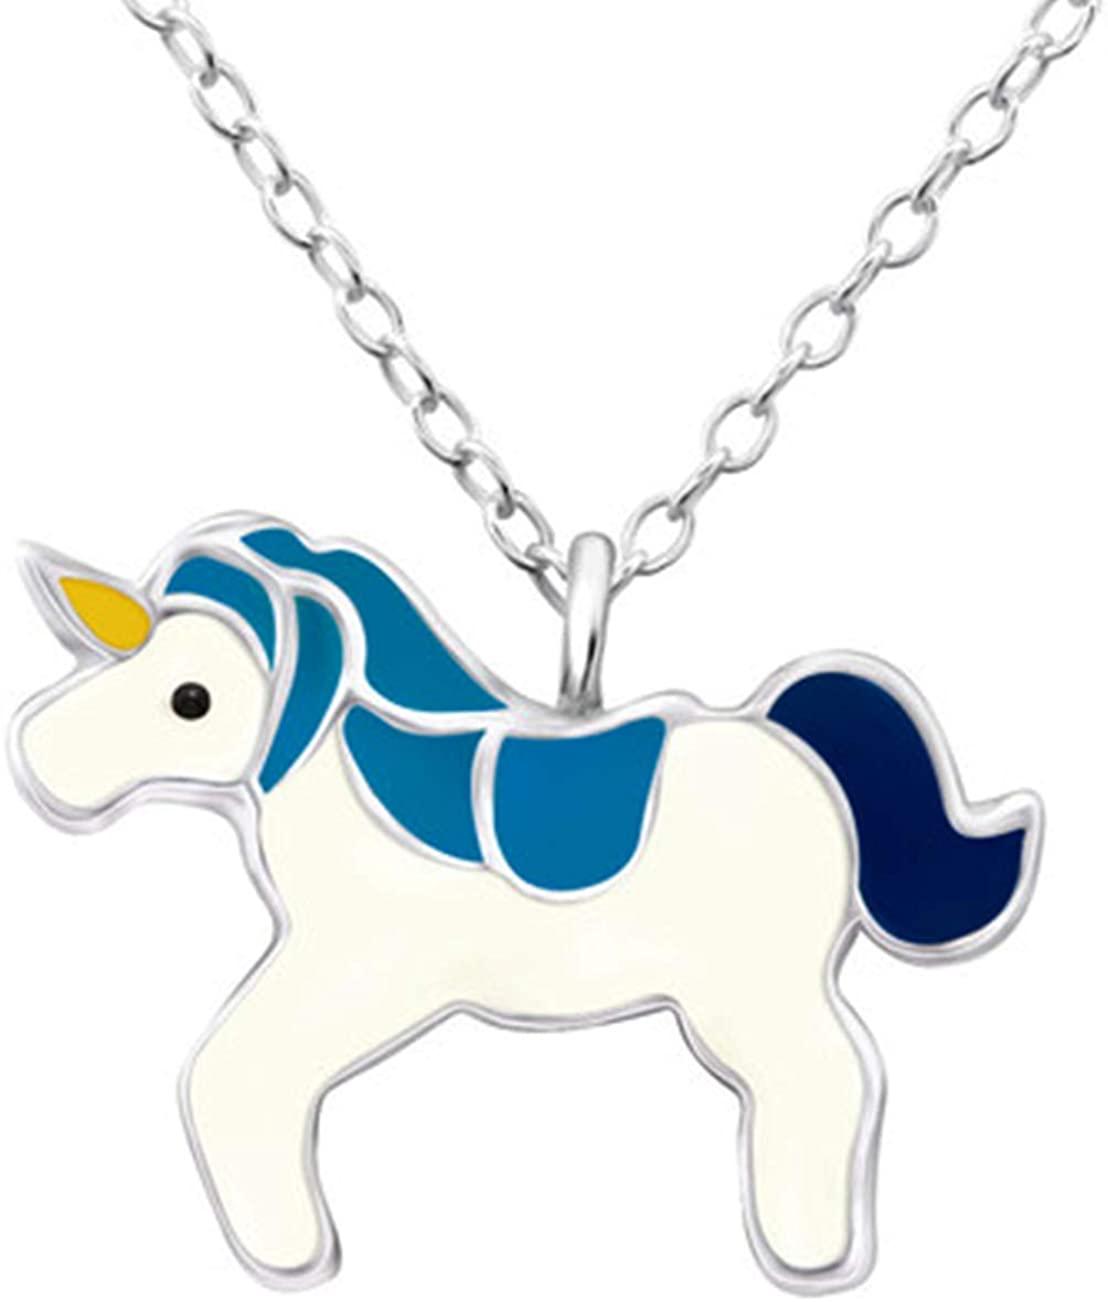 Hypoallergenic Sterling Silver Blue Unicorn Pendant Necklace (Nickel Free)